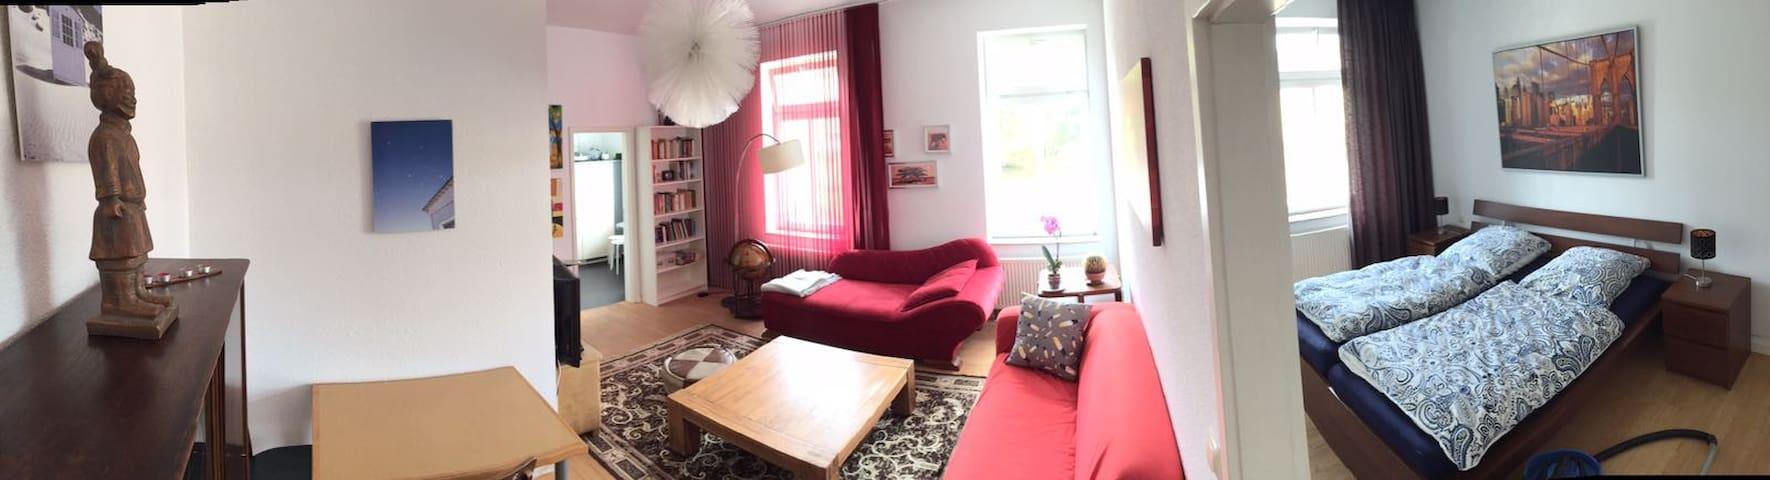 Chemnitz Kaßberg 2 Raum Wohnung (Apartment)